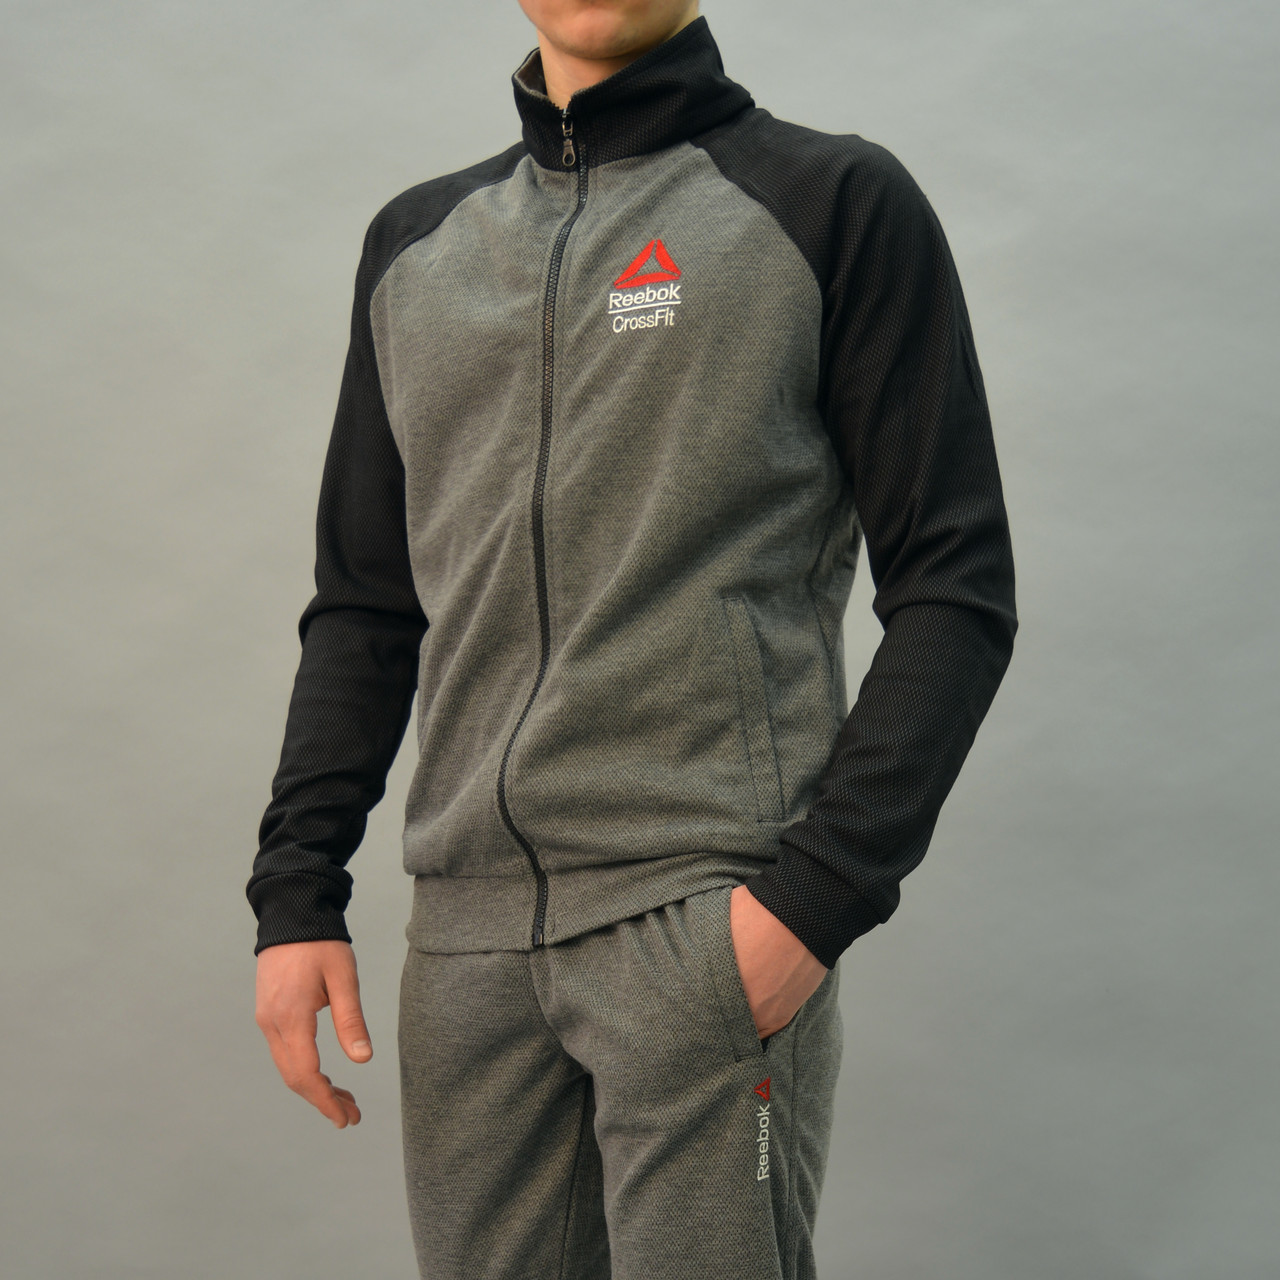 Серый мужской спортивный костюм Reebok Crossfit (Рибок)  6097cdb1b5a25